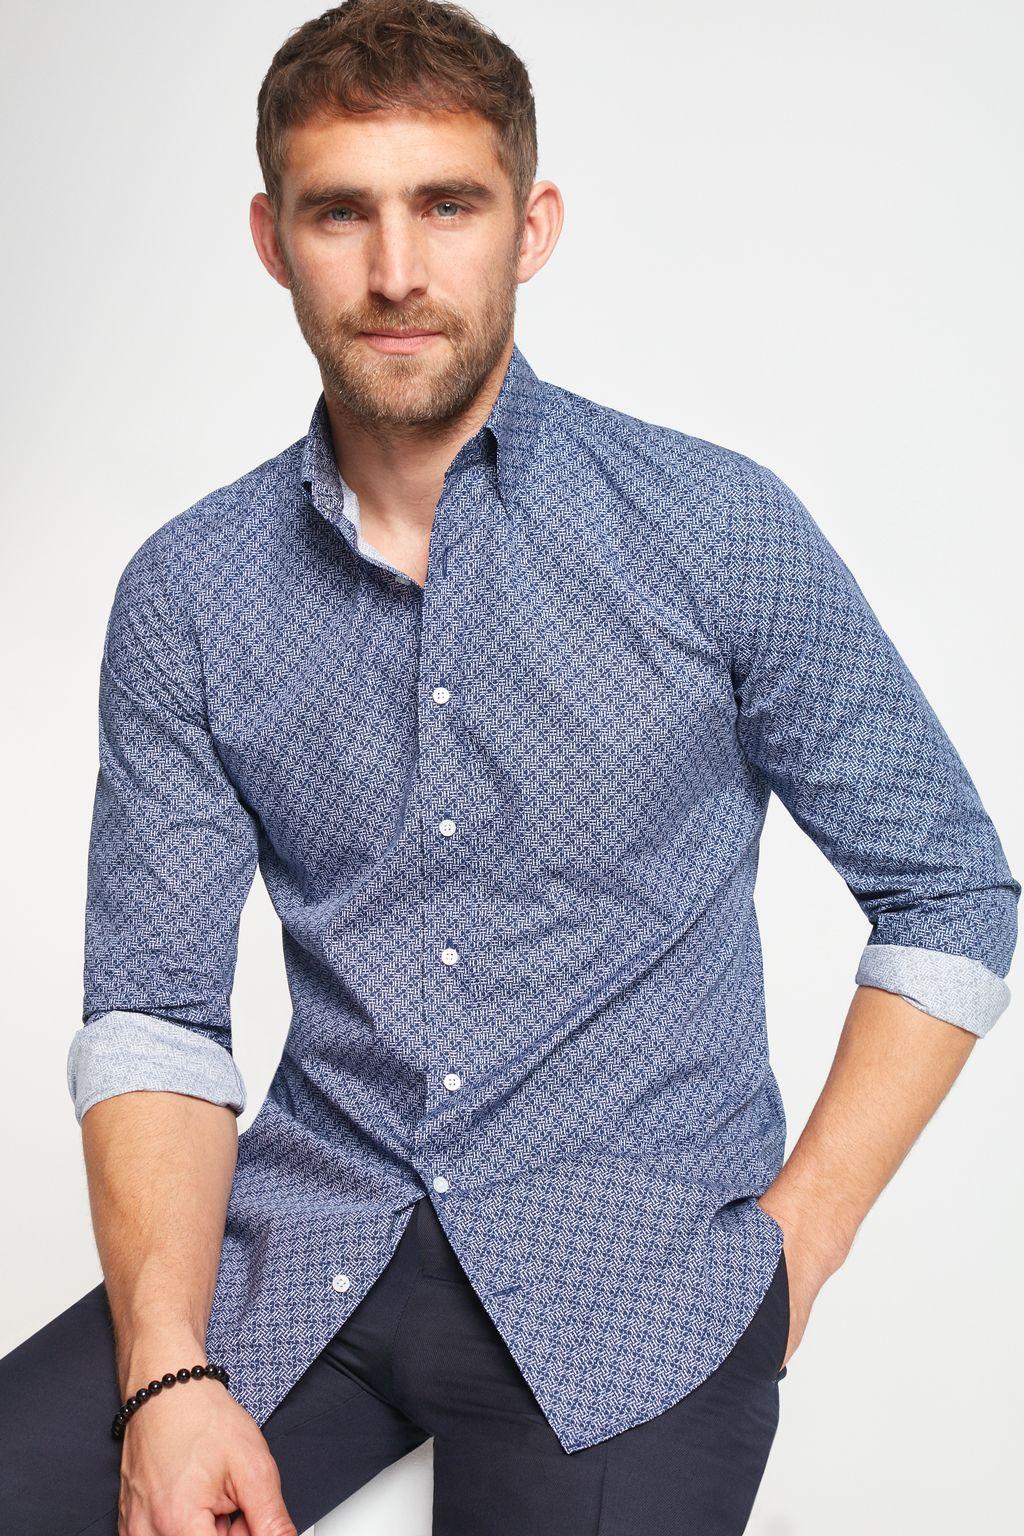 CH poplin shirt